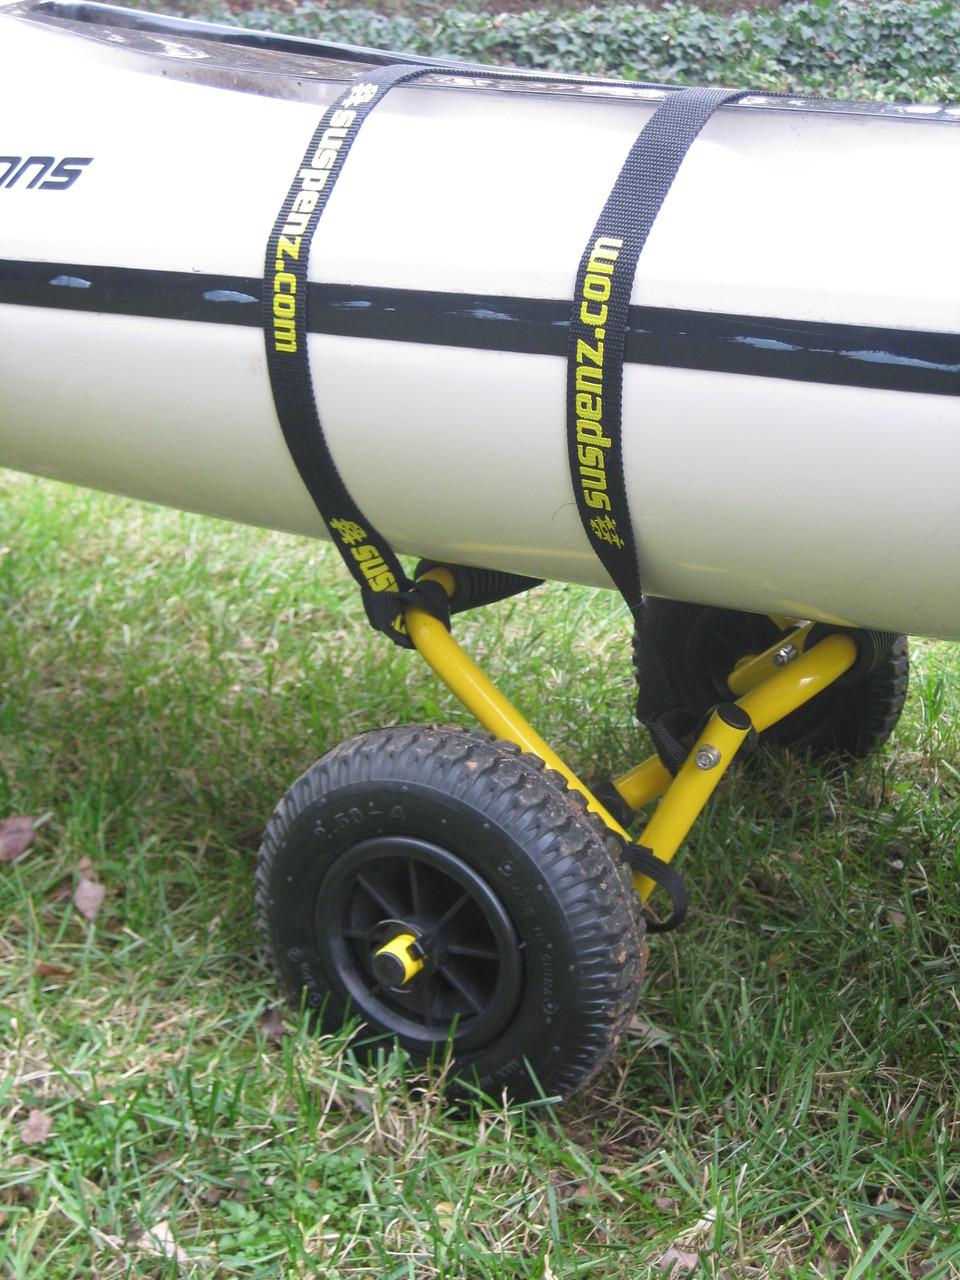 Premium Kayak Dolly Airless Tires Storeyourboard Com